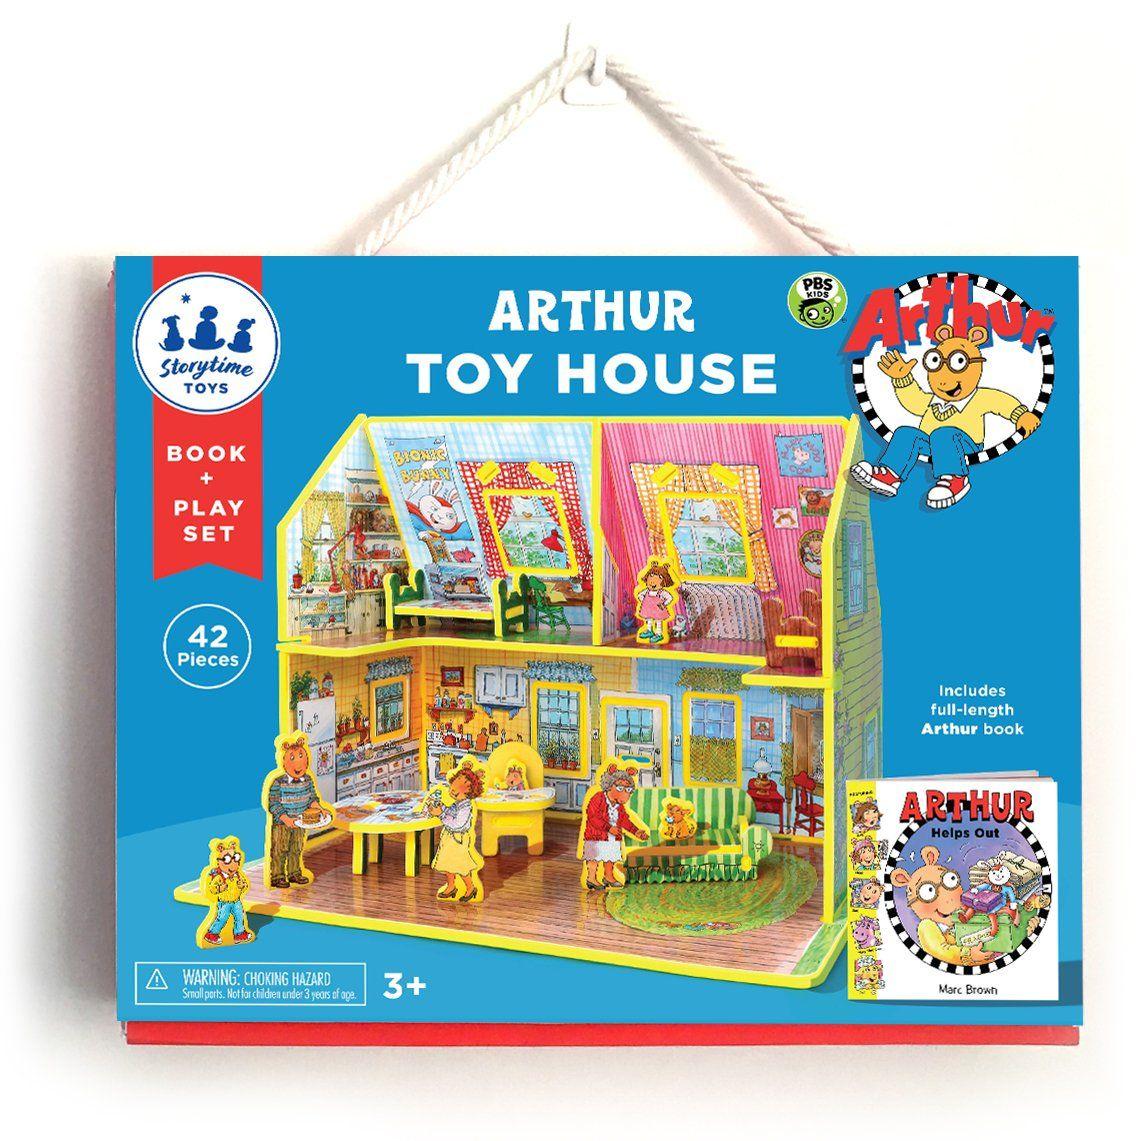 Arthur toy house toy house house book playset